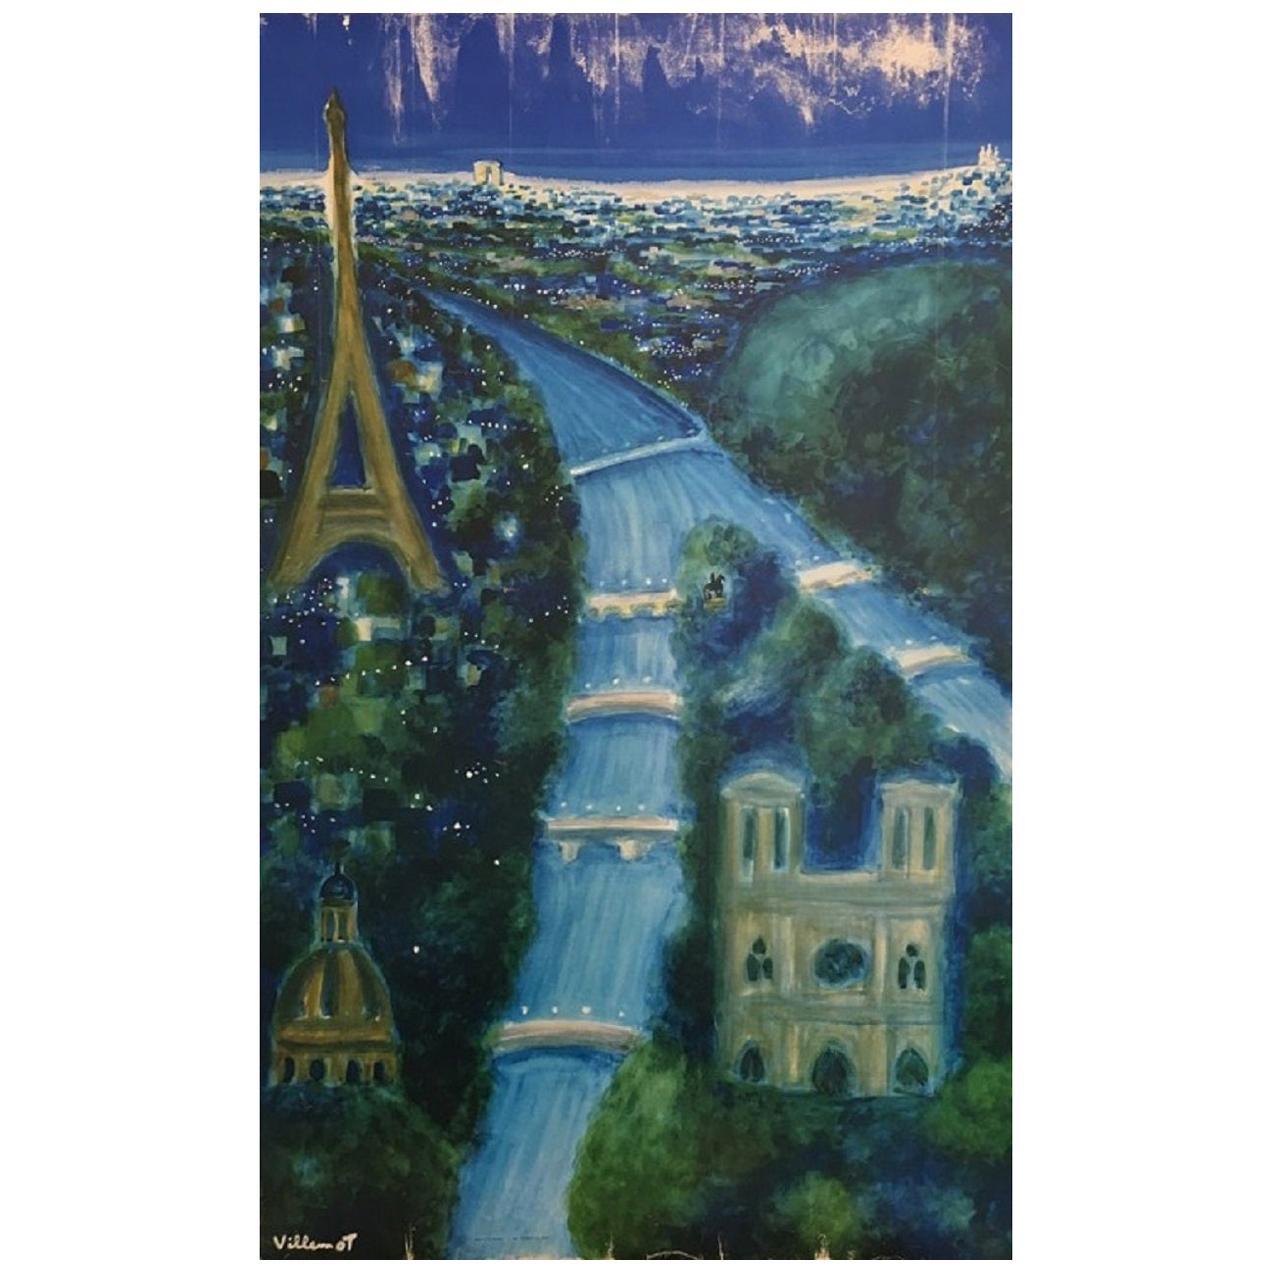 Villemot Paris at Night 'Air France' Original Vintage Poster